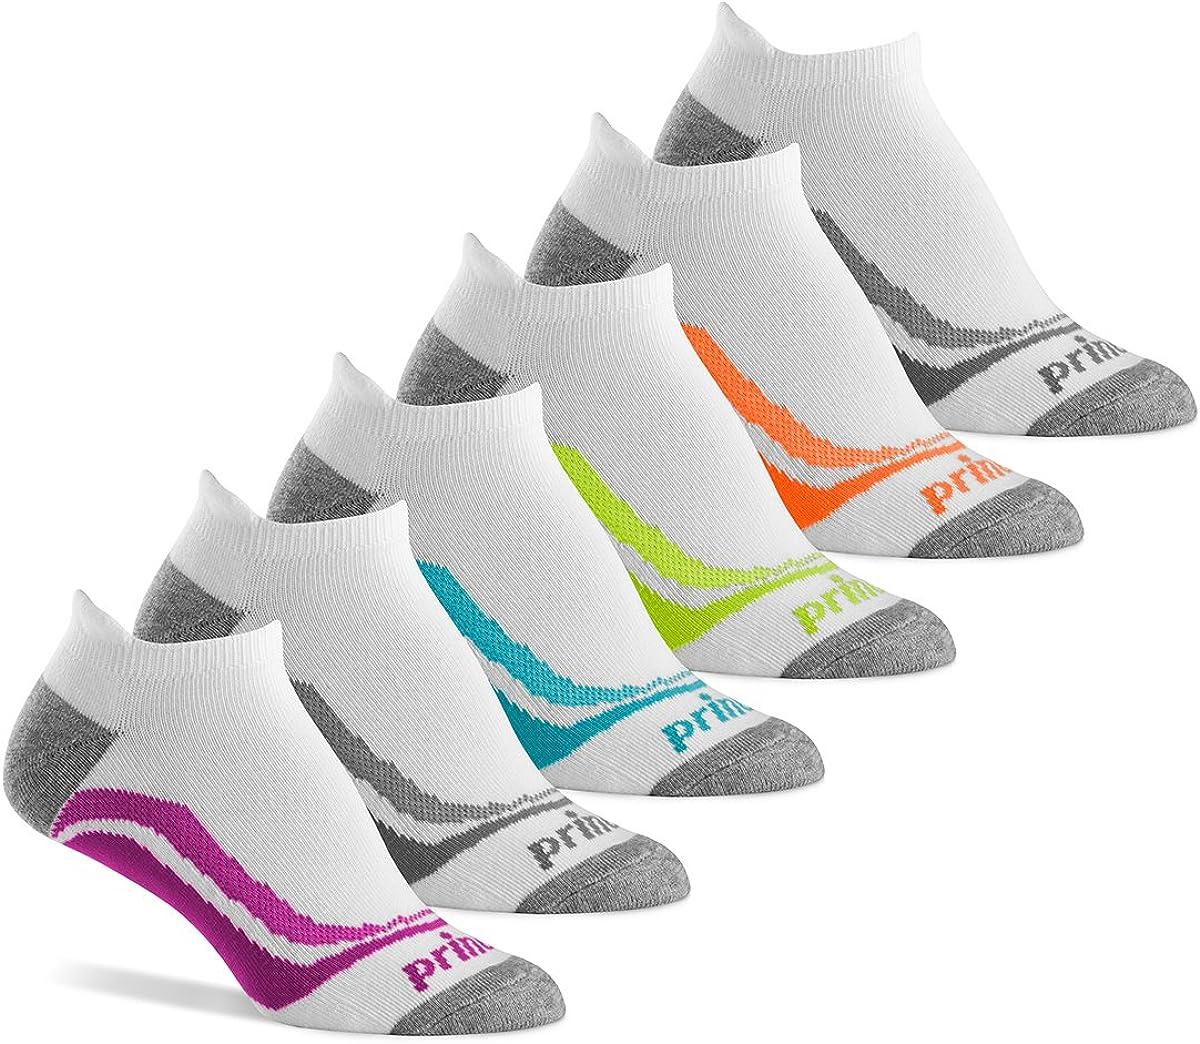 Size Large Gym Running Tennis 6 Pair Puma Men/'s Crew Socks Black Grey